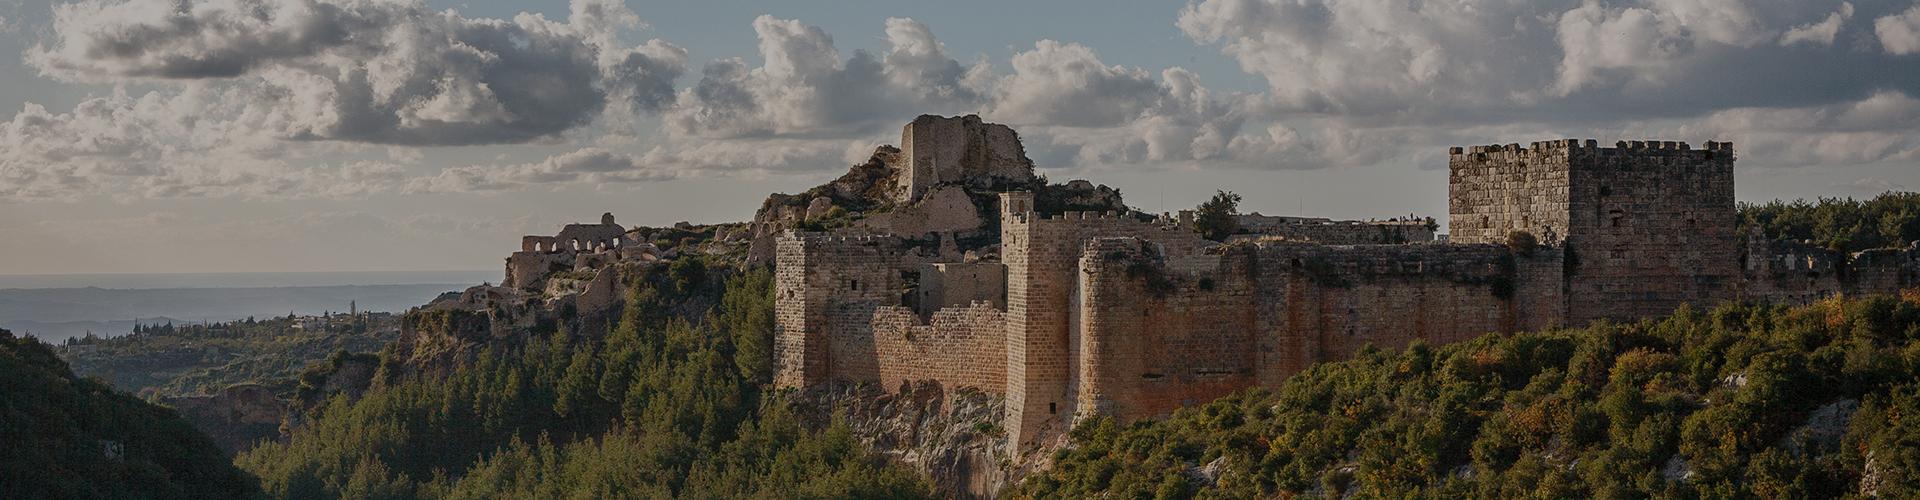 Landmark photograph of Syria